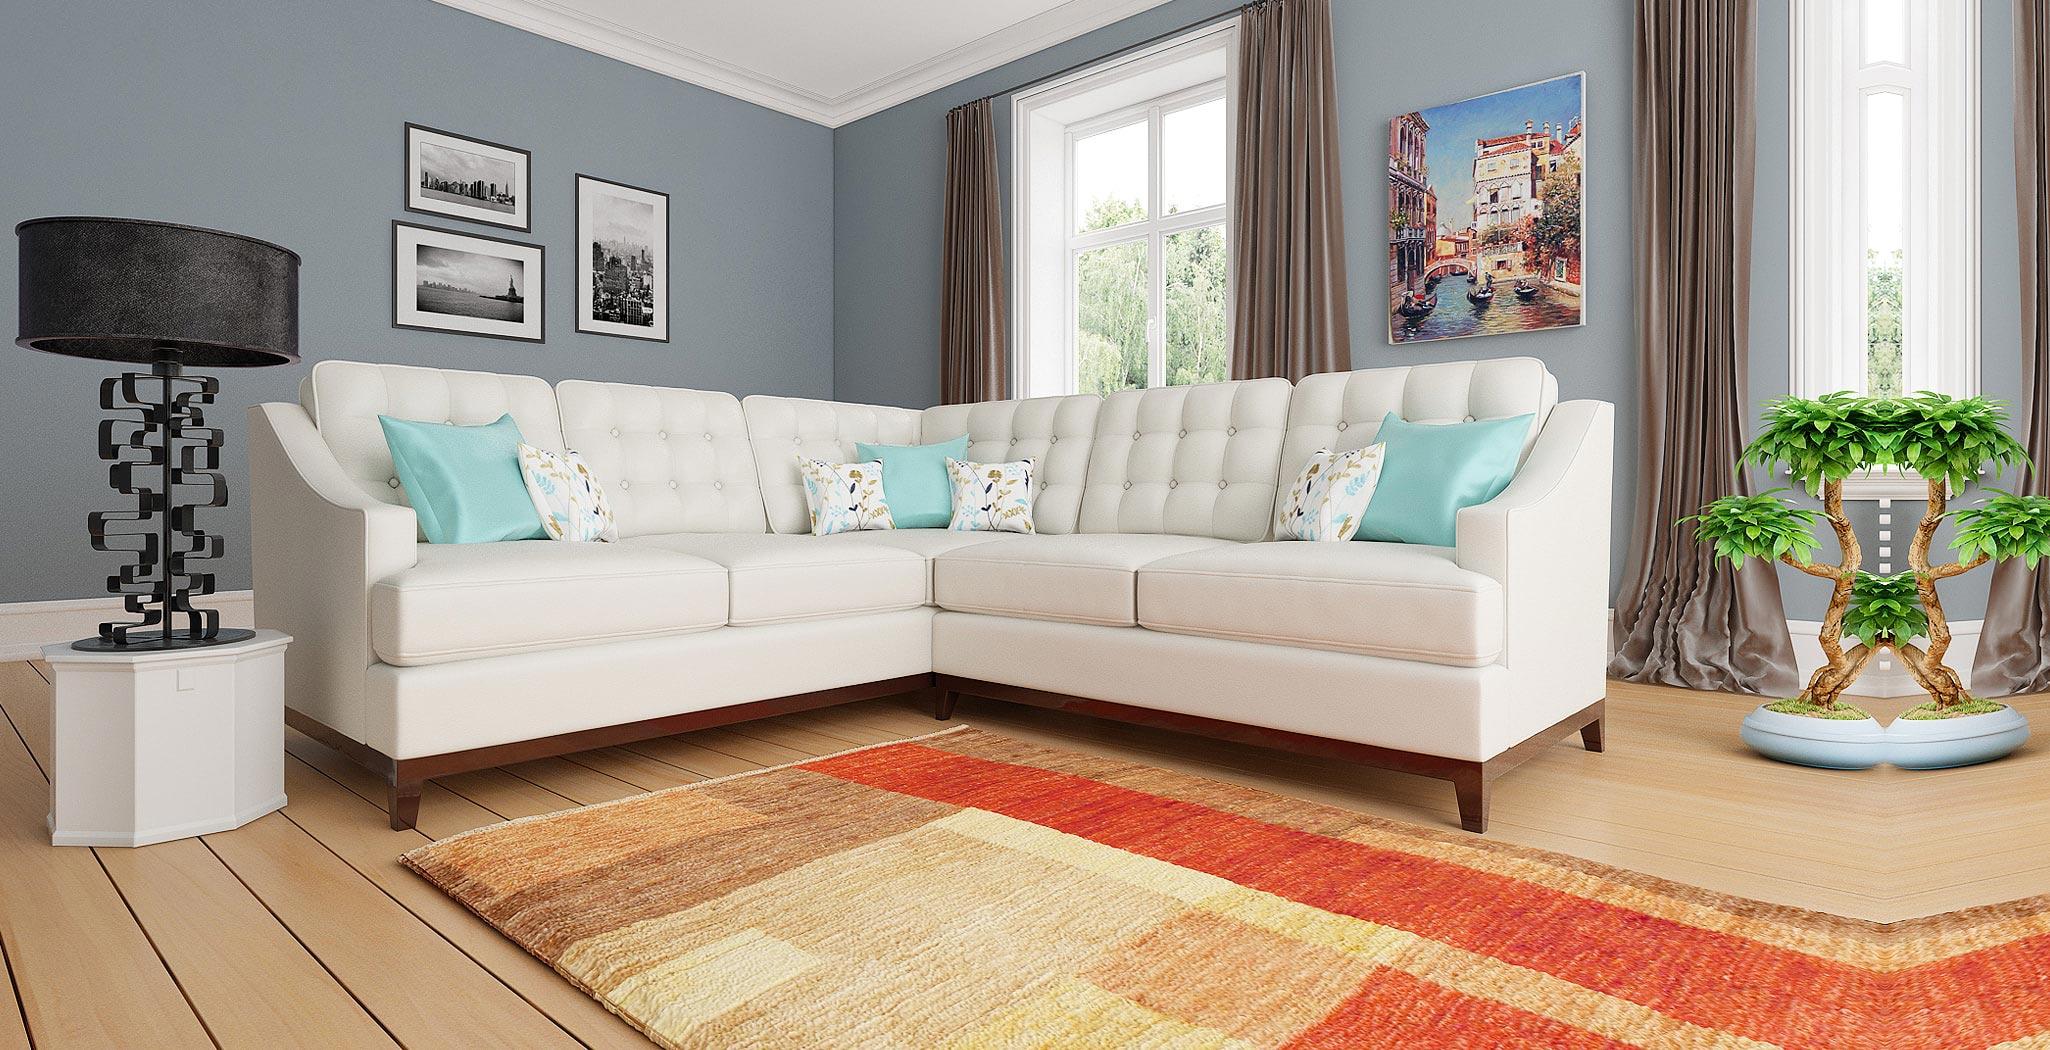 geneva sectional furniture gallery 4